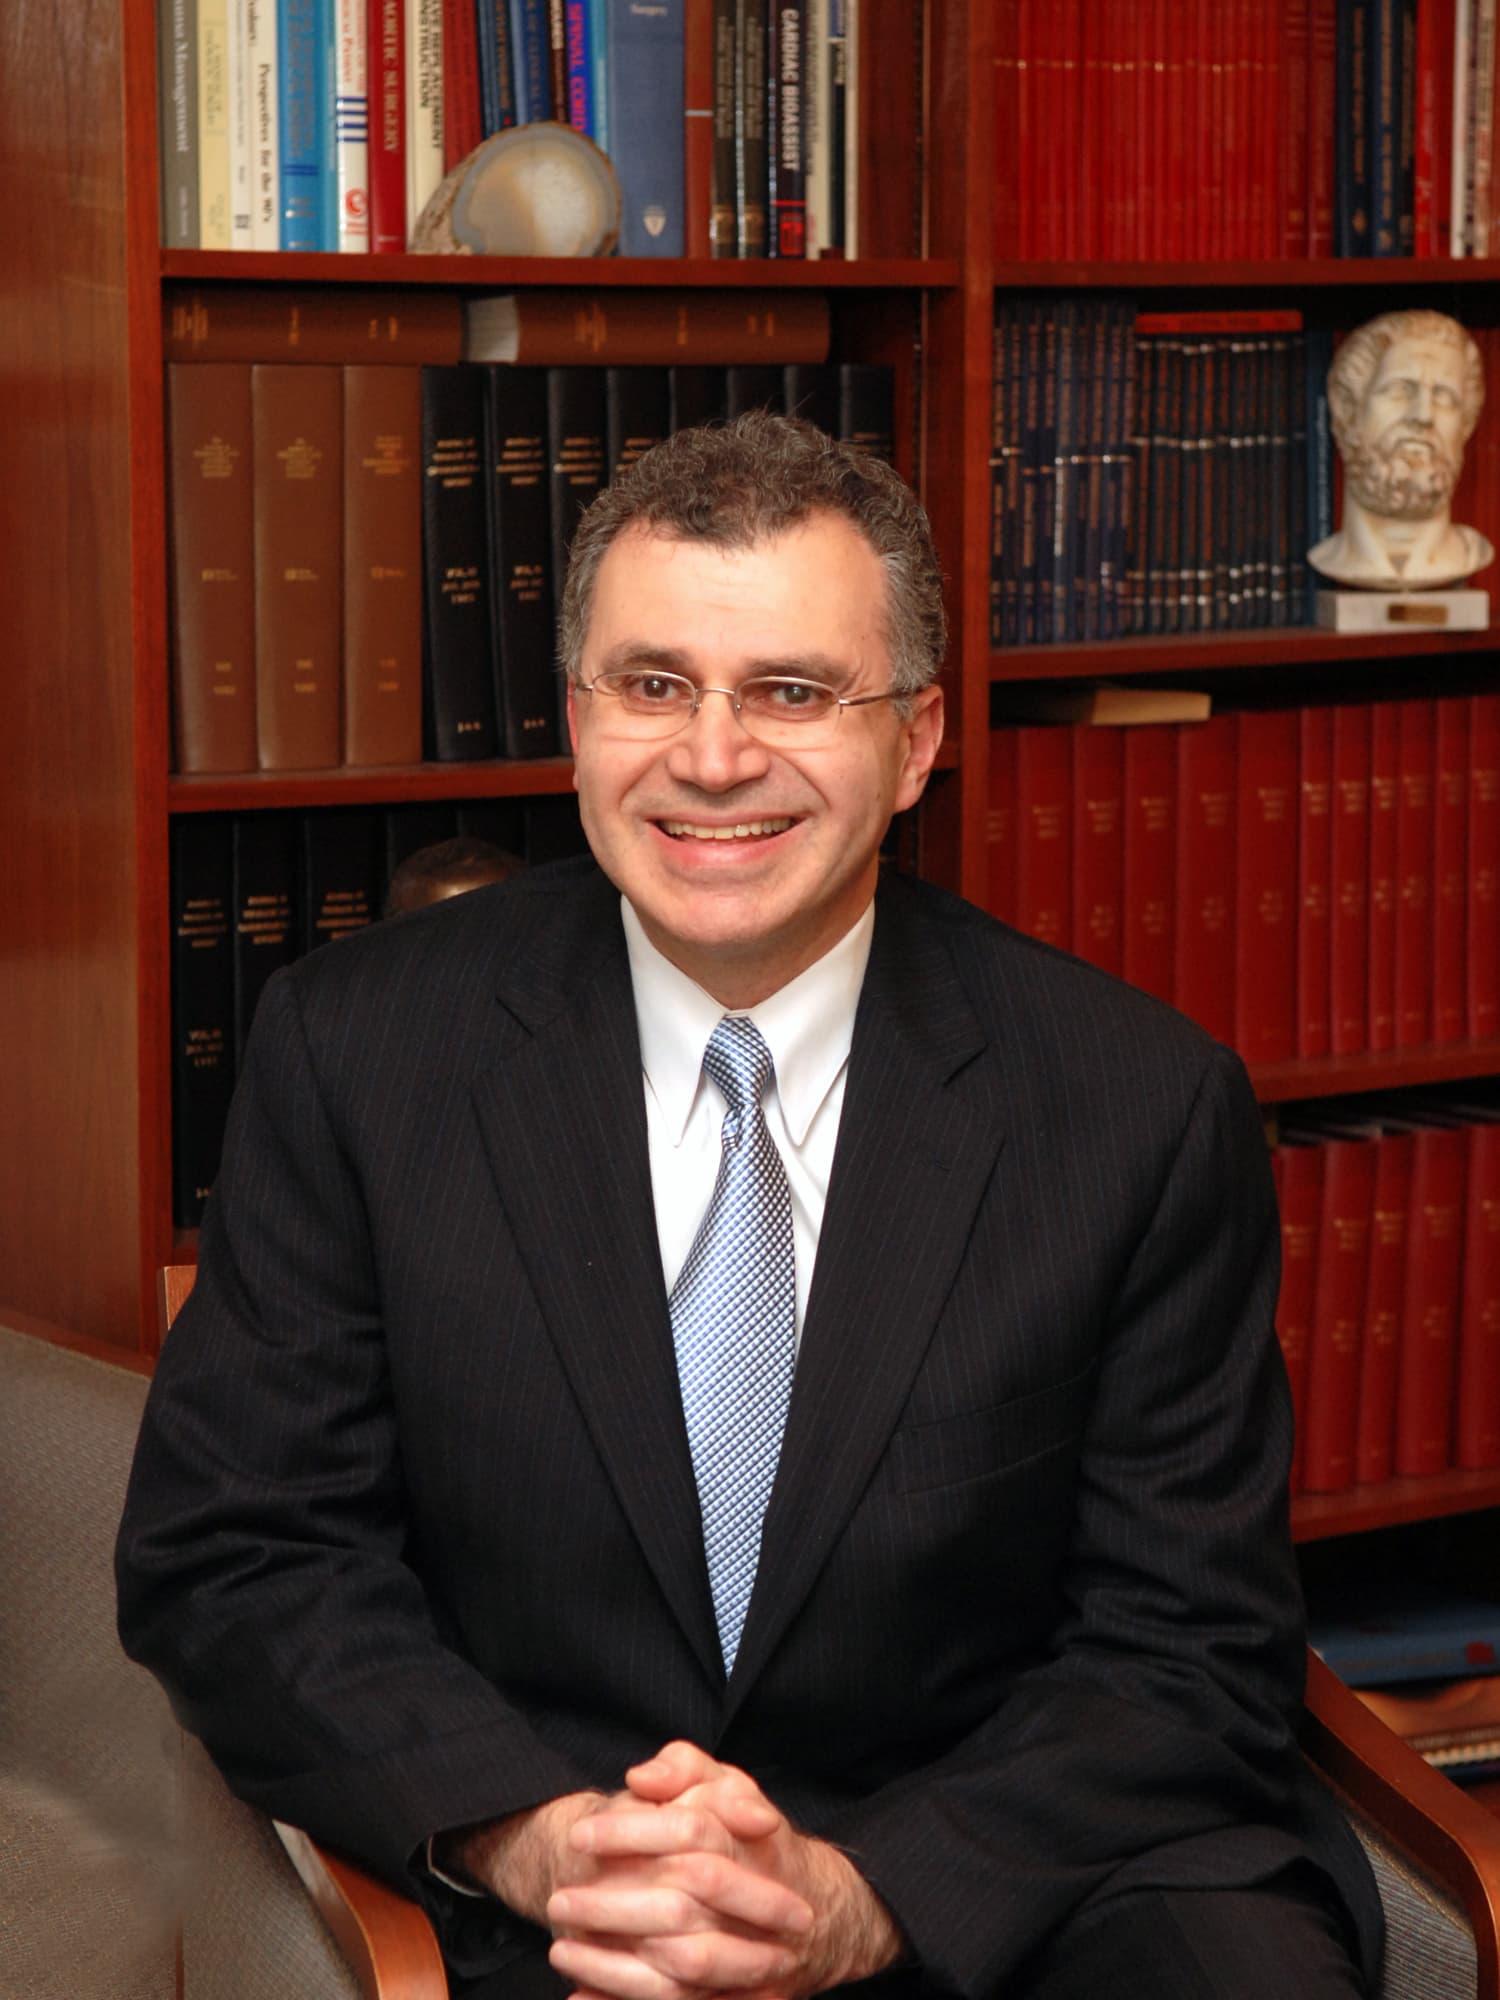 John Elefteriades